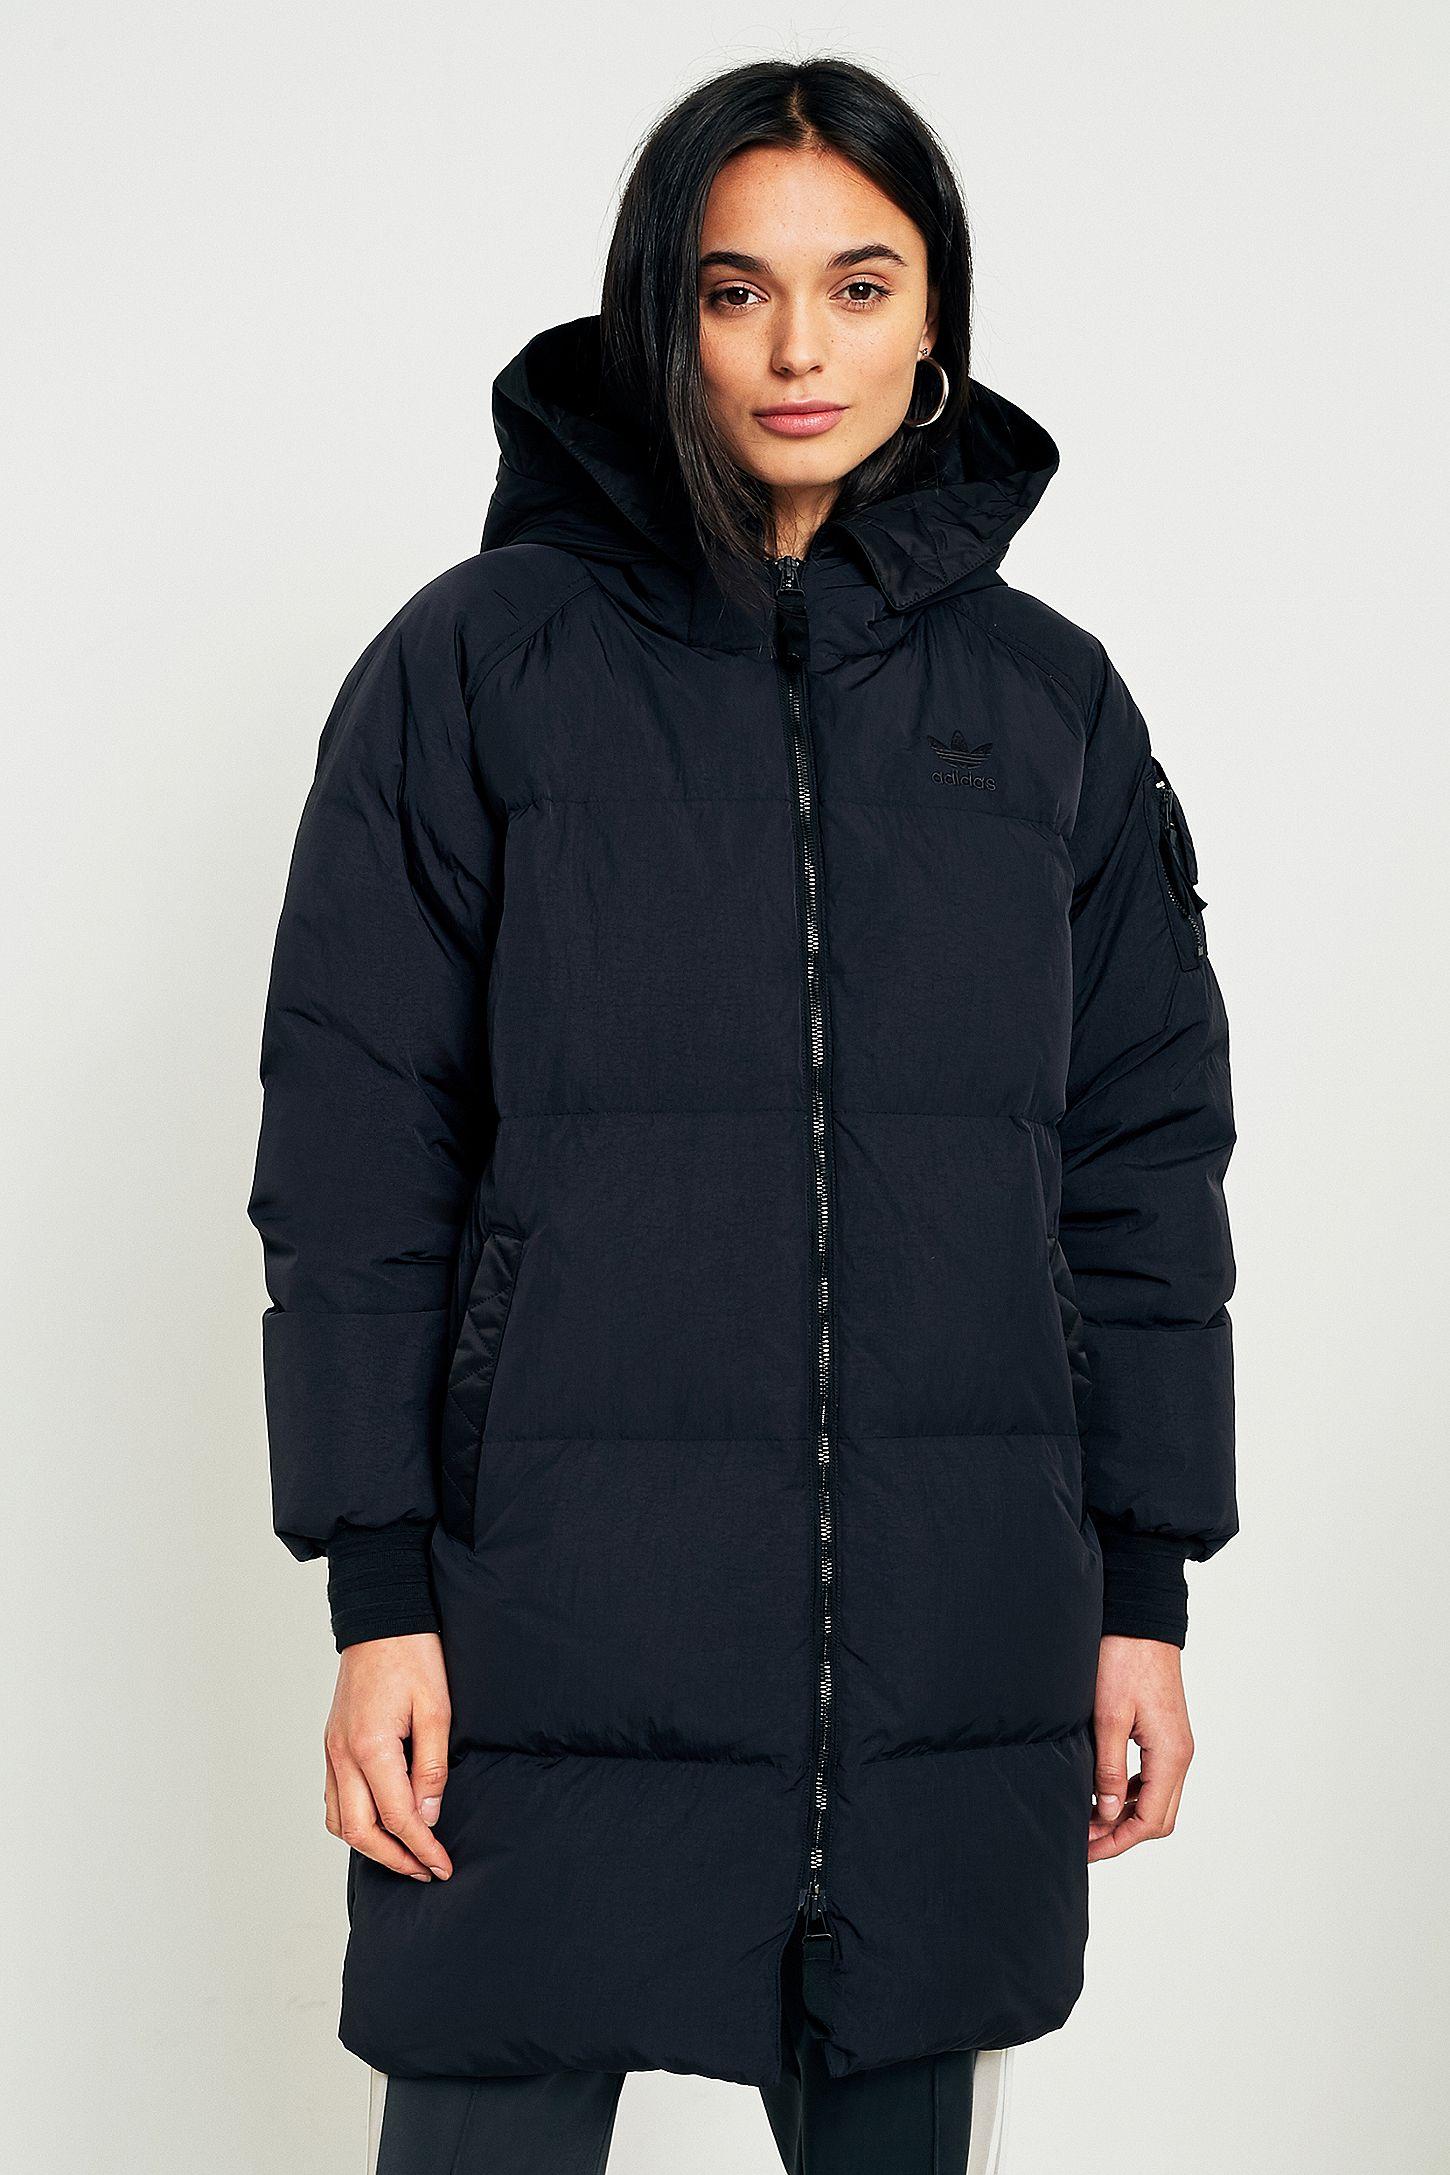 5d22b8c4b423 adidas Originals Black Long Puffer Jacket